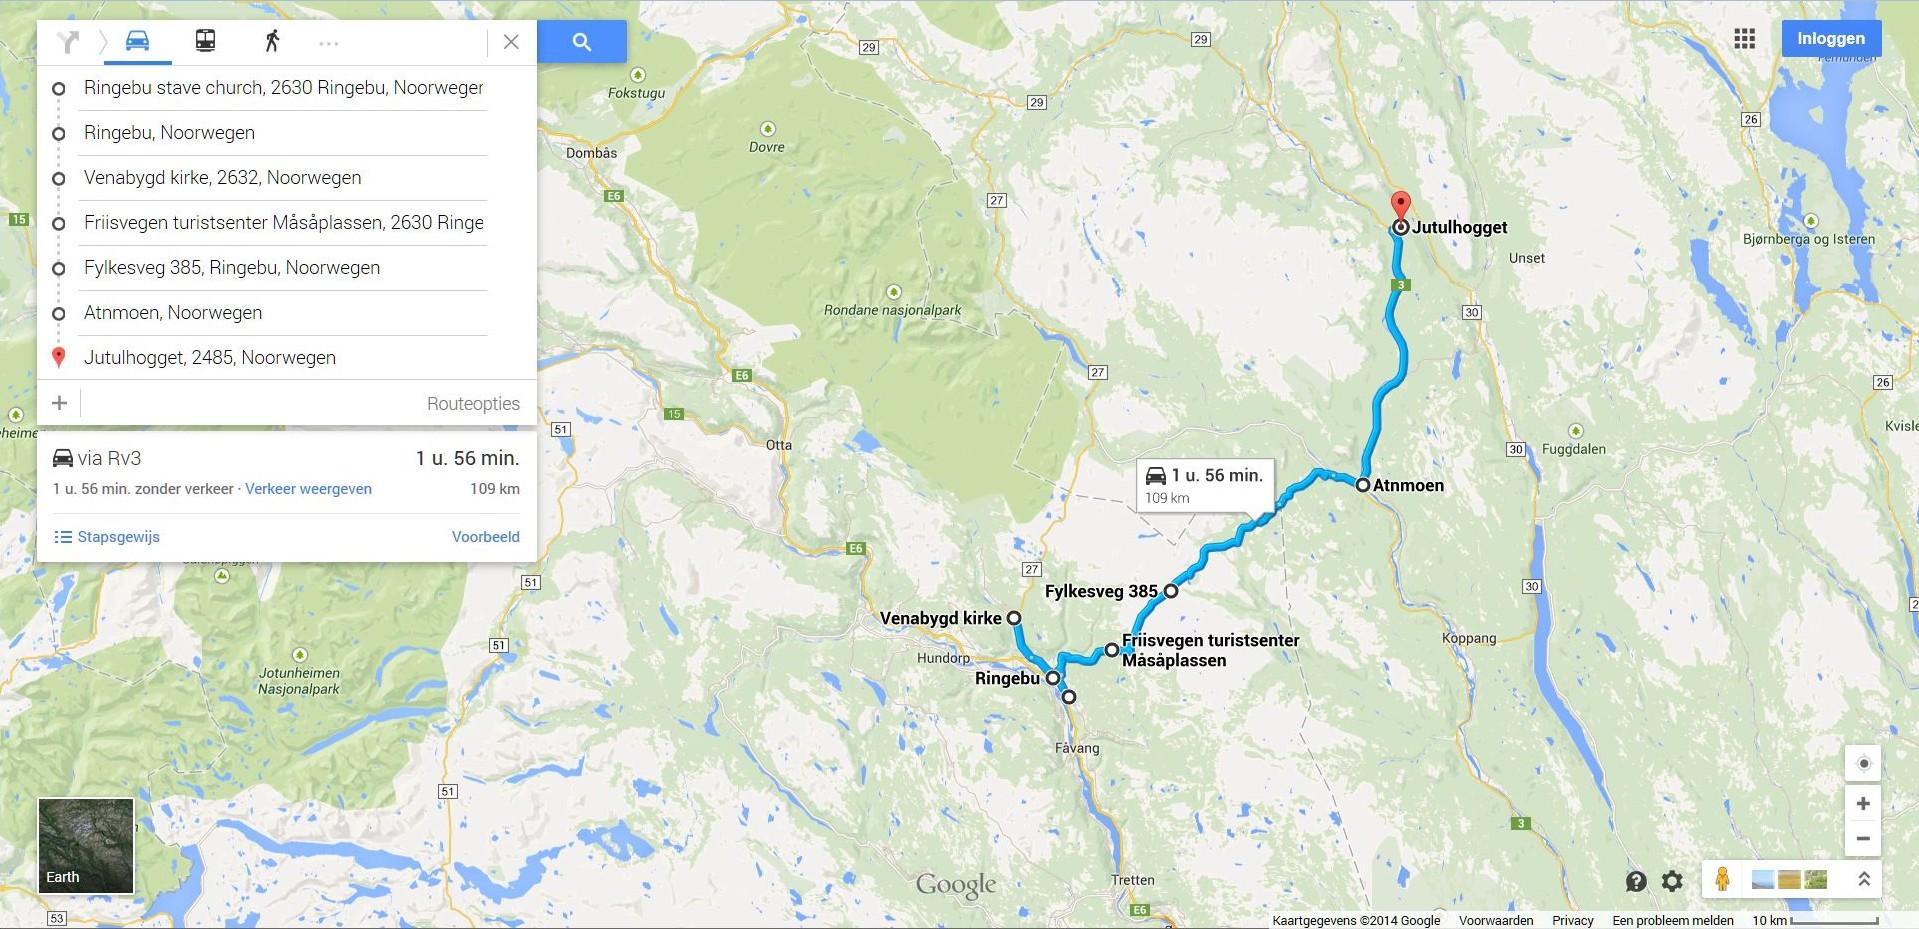 jutulhogget kart 2.6 2.8 Oppland en Hedmark   Onze autovakanties in Noorwegen jutulhogget kart